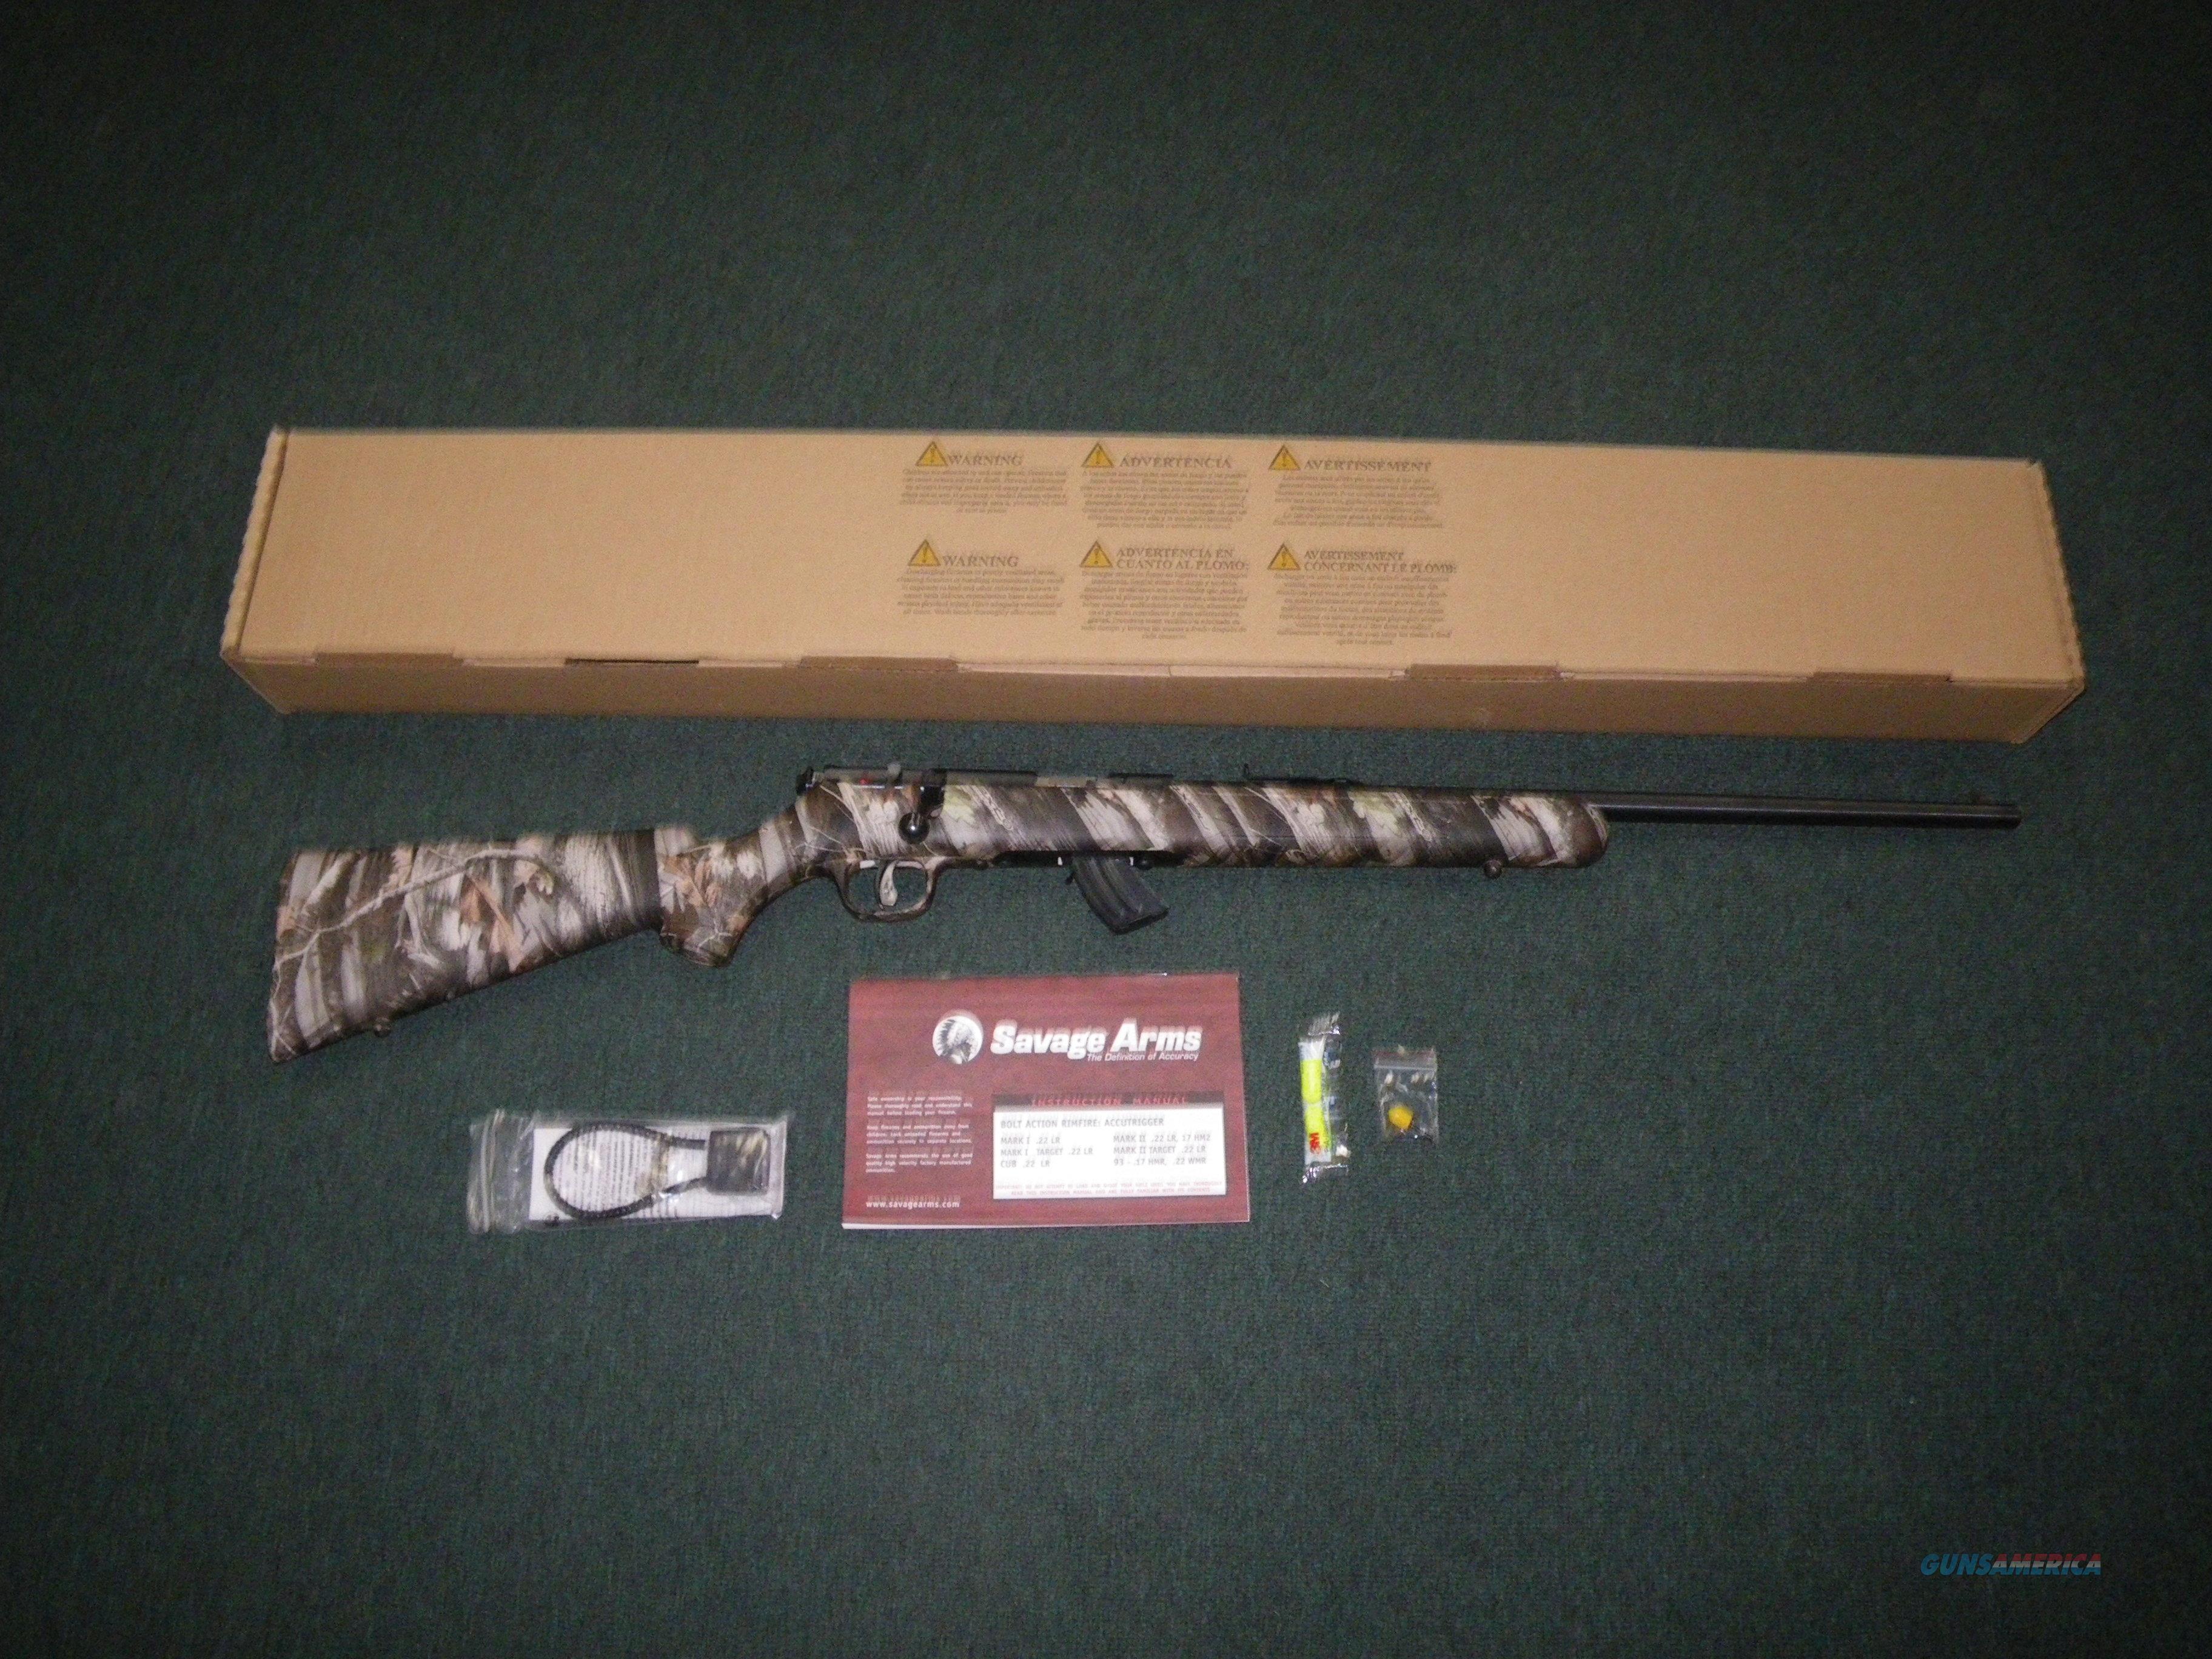 "Savage Mark II Camo 22lr 21"" NEW Accutrigger 26800  Guns > Rifles > Savage Rifles > Accutrigger Models > Sporting"